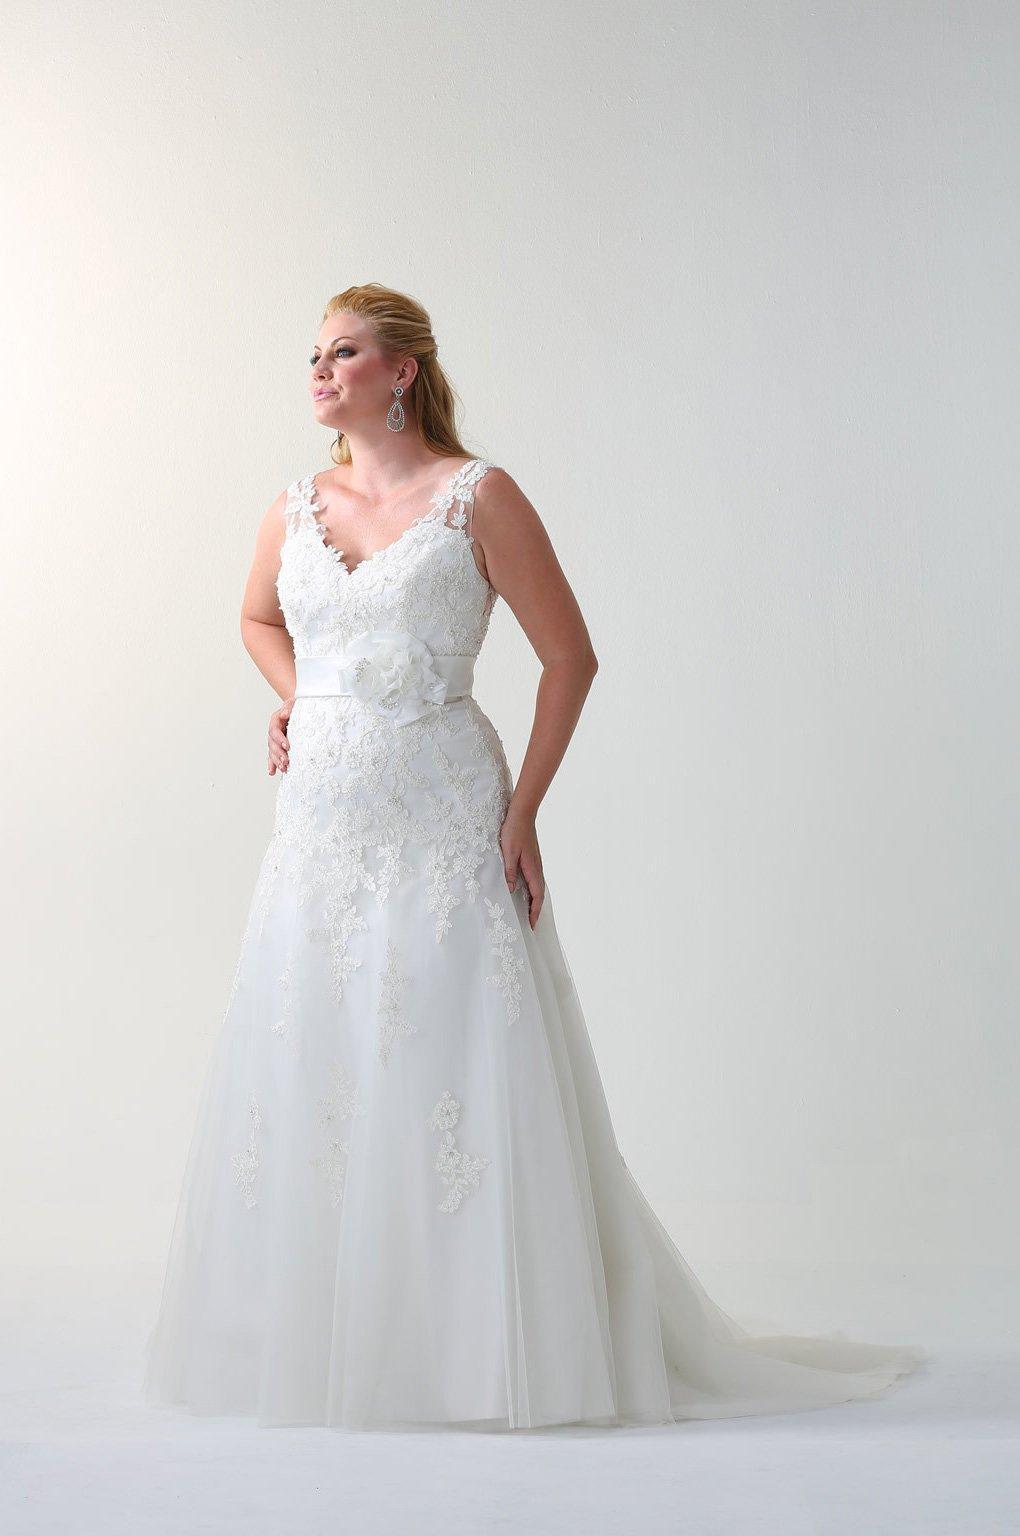 Venus Bridal Women's